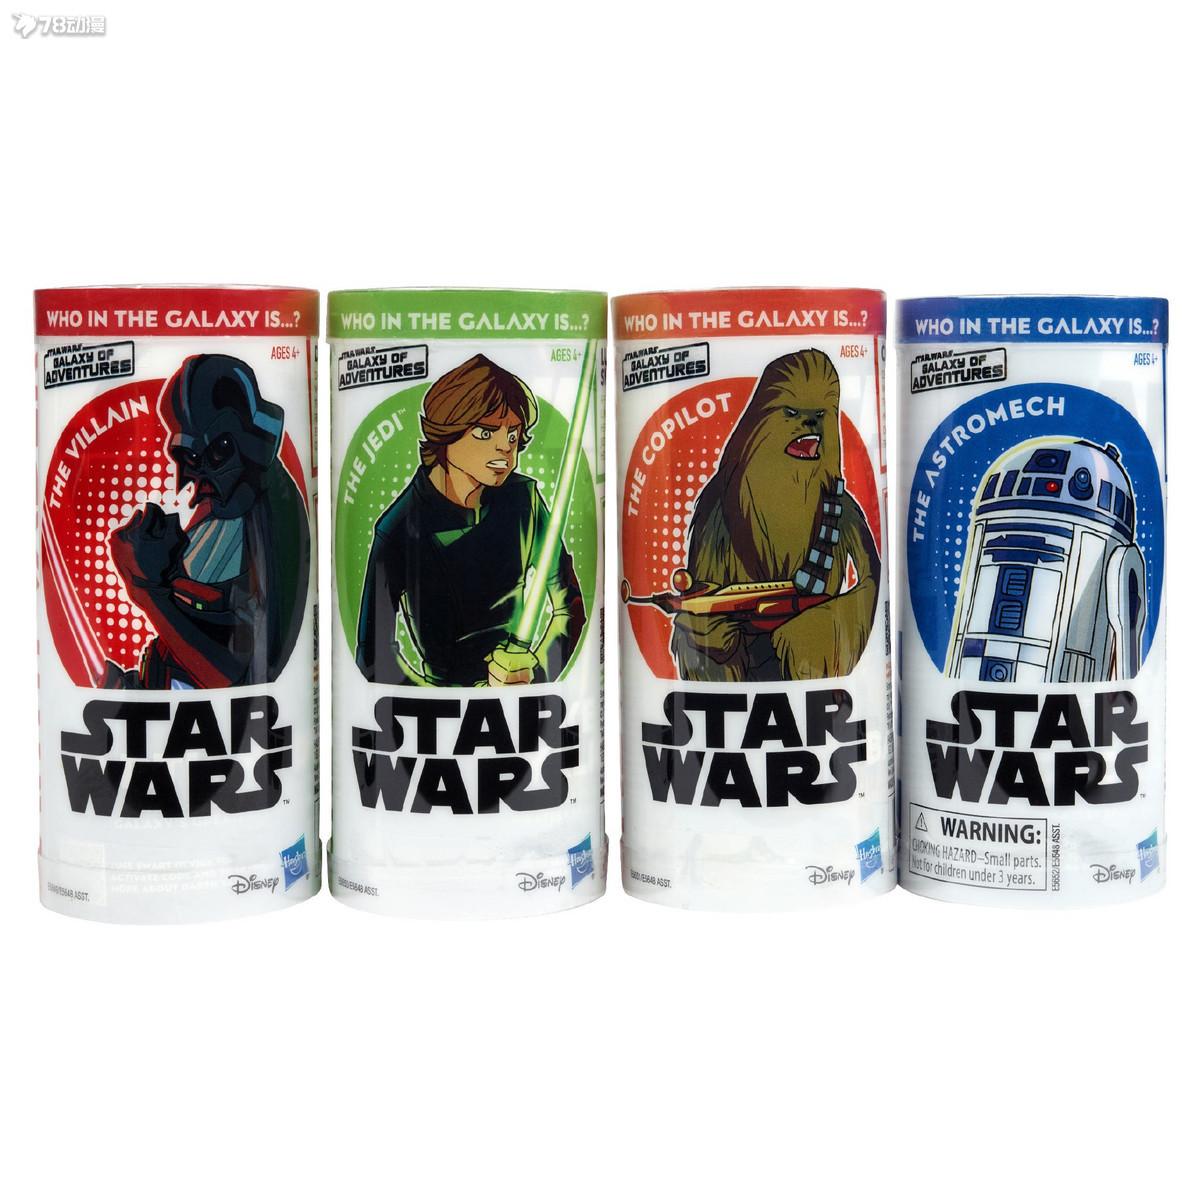 Star-Wars-Galaxy-Adventures-003.jpg